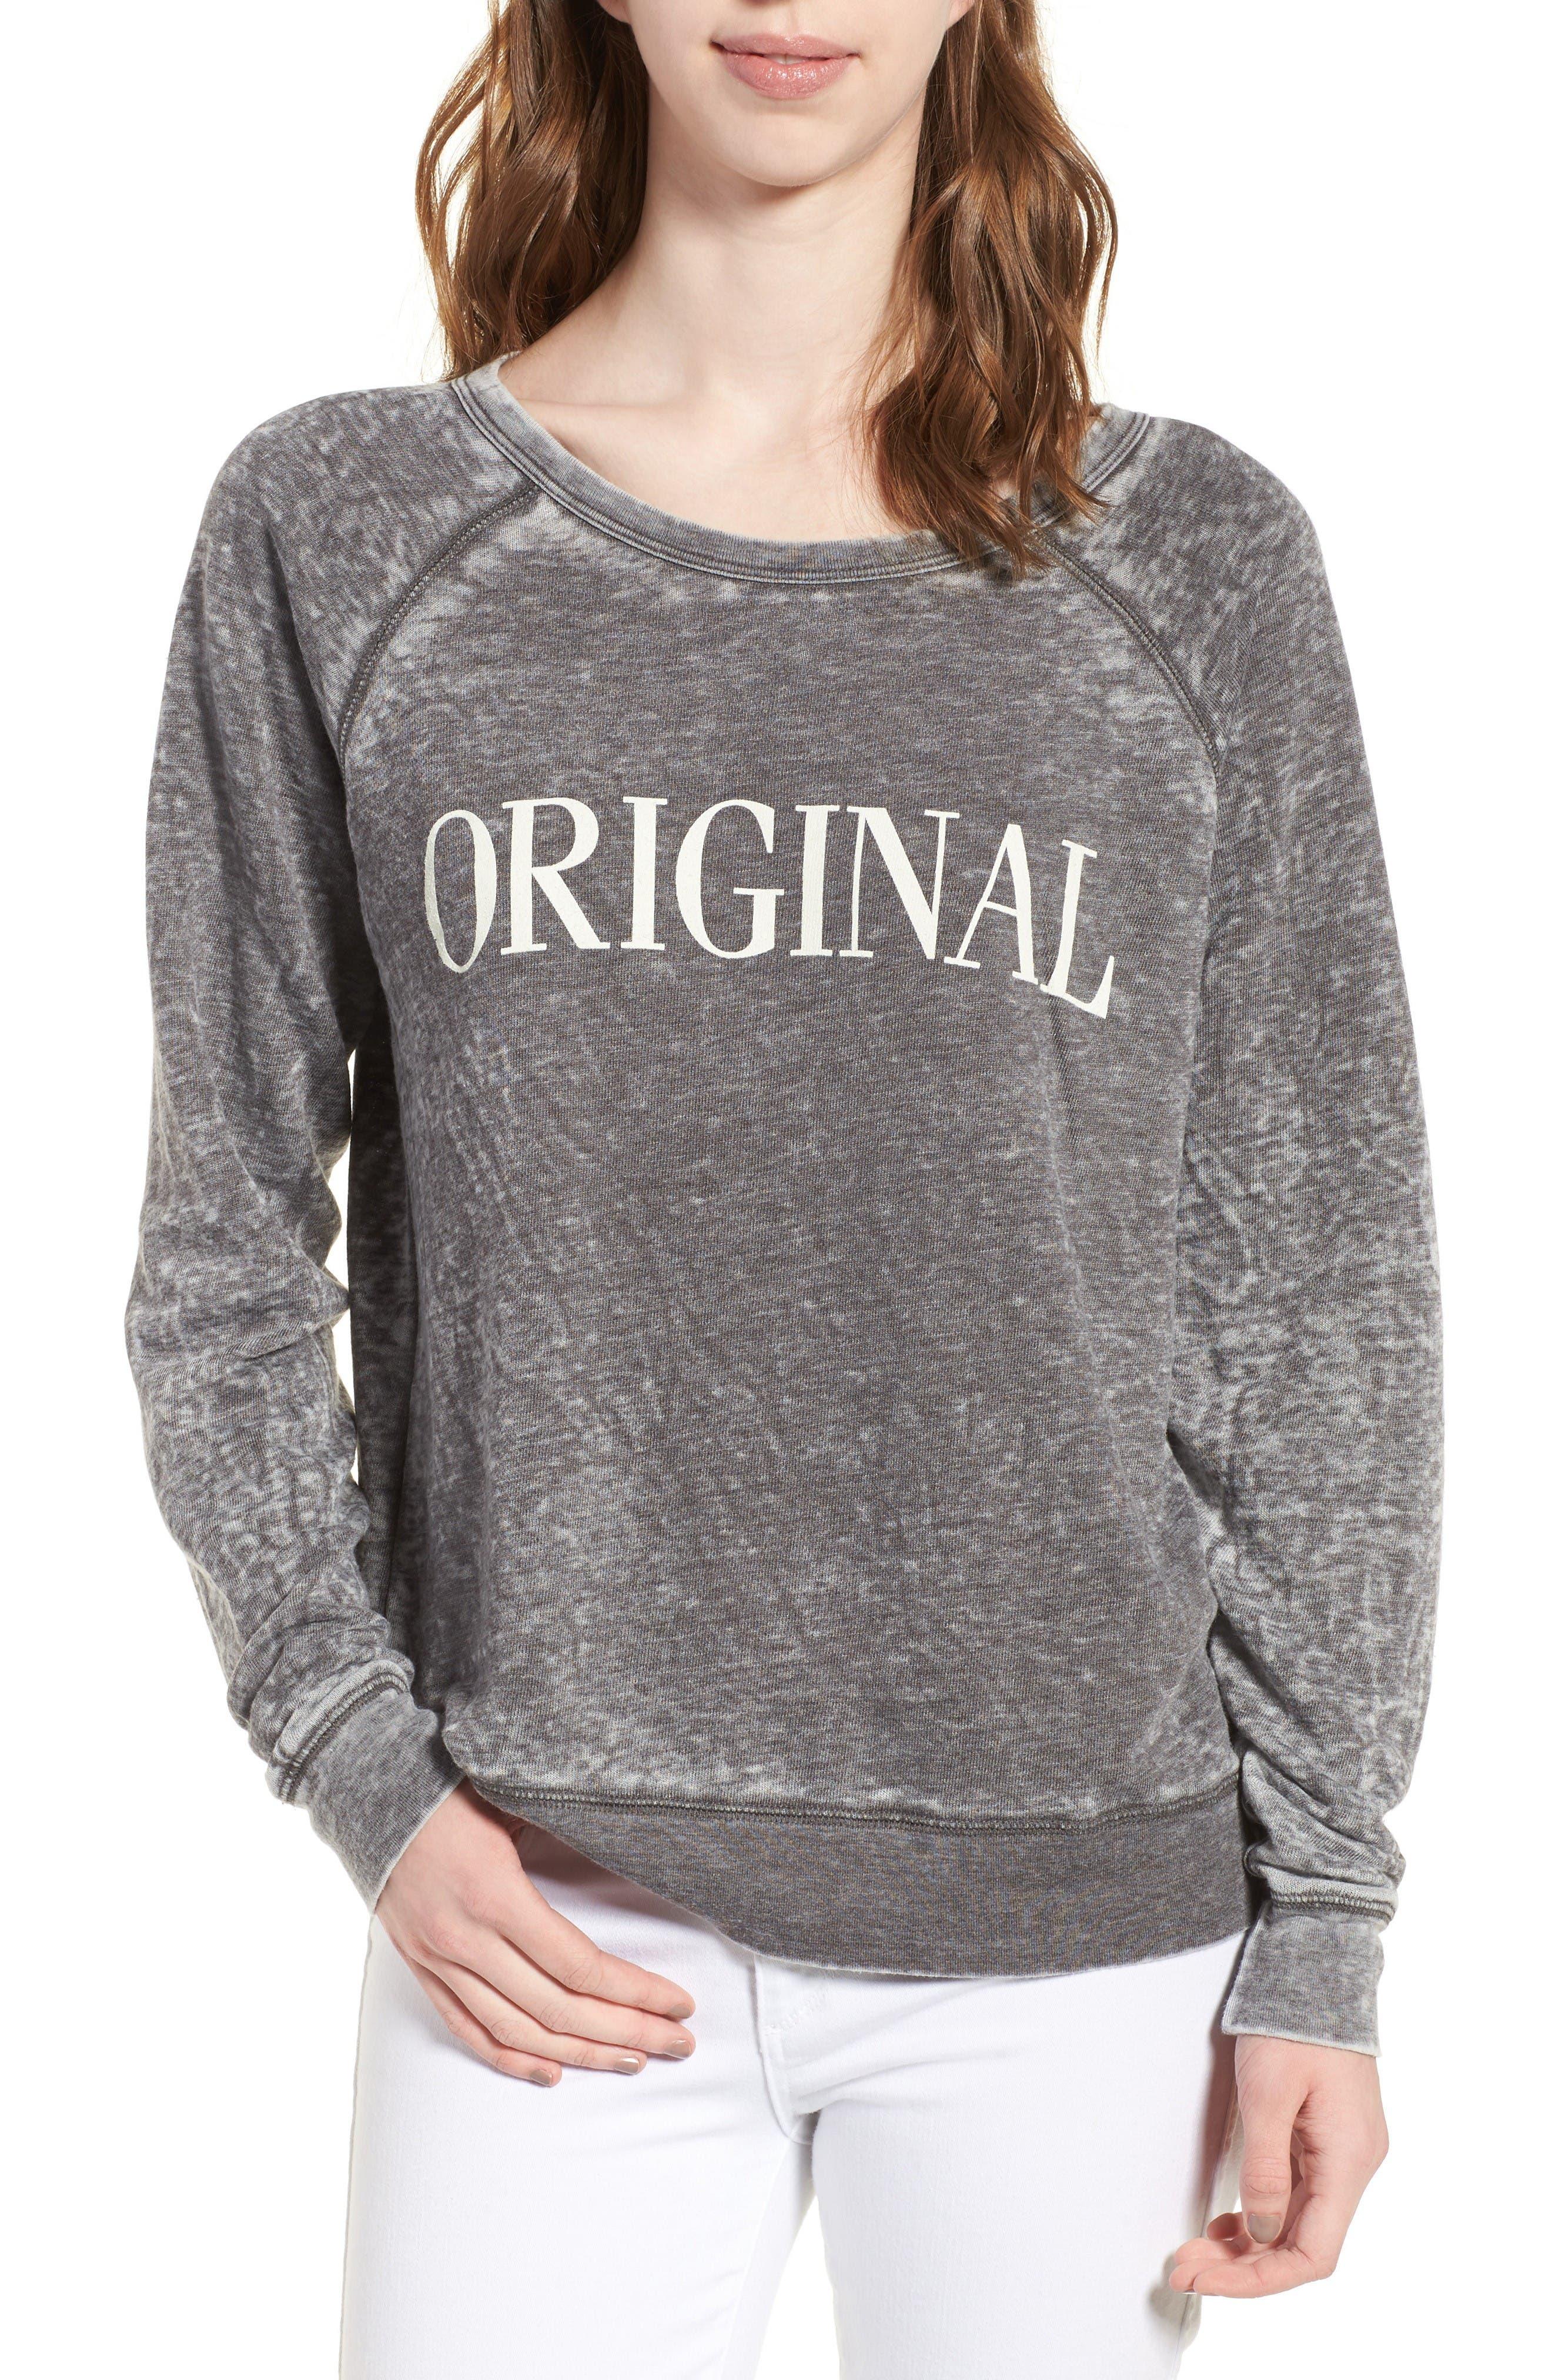 Junk Food Original Burnout Sweatshirt